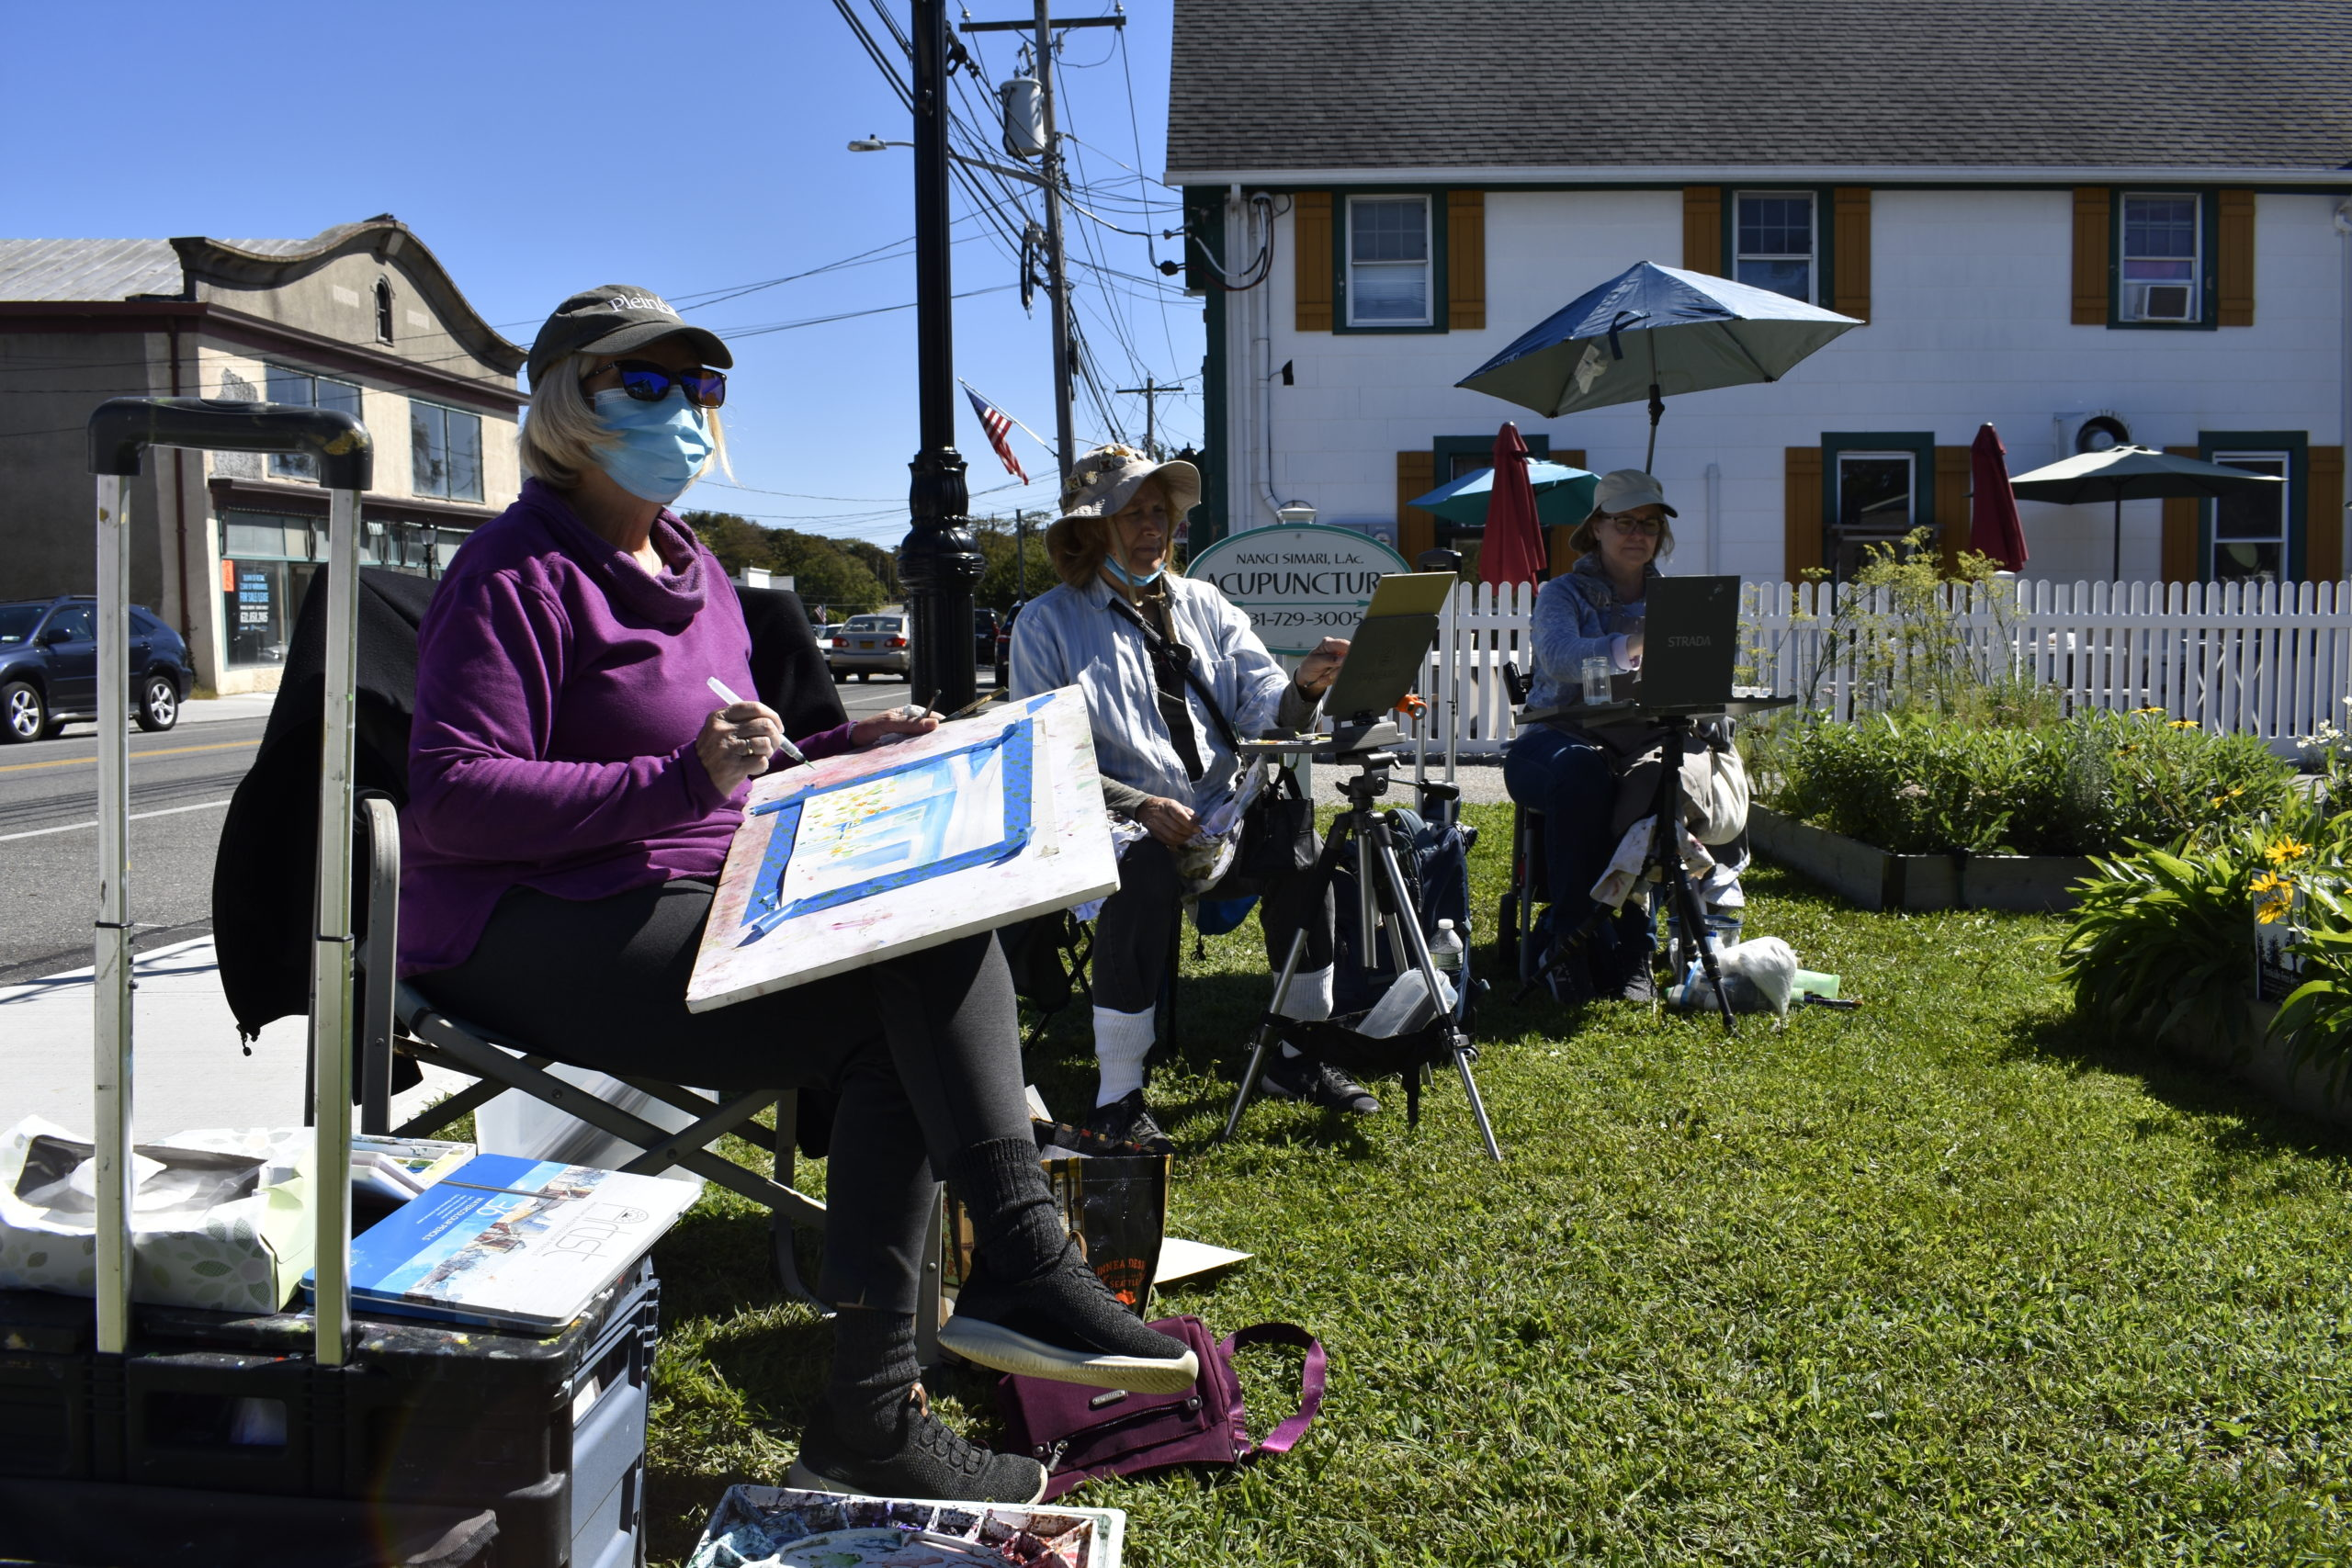 Plein air artists Susan Bracken Gilday, Laurie Schlageter and Laurie Spellman paint on Main Street.